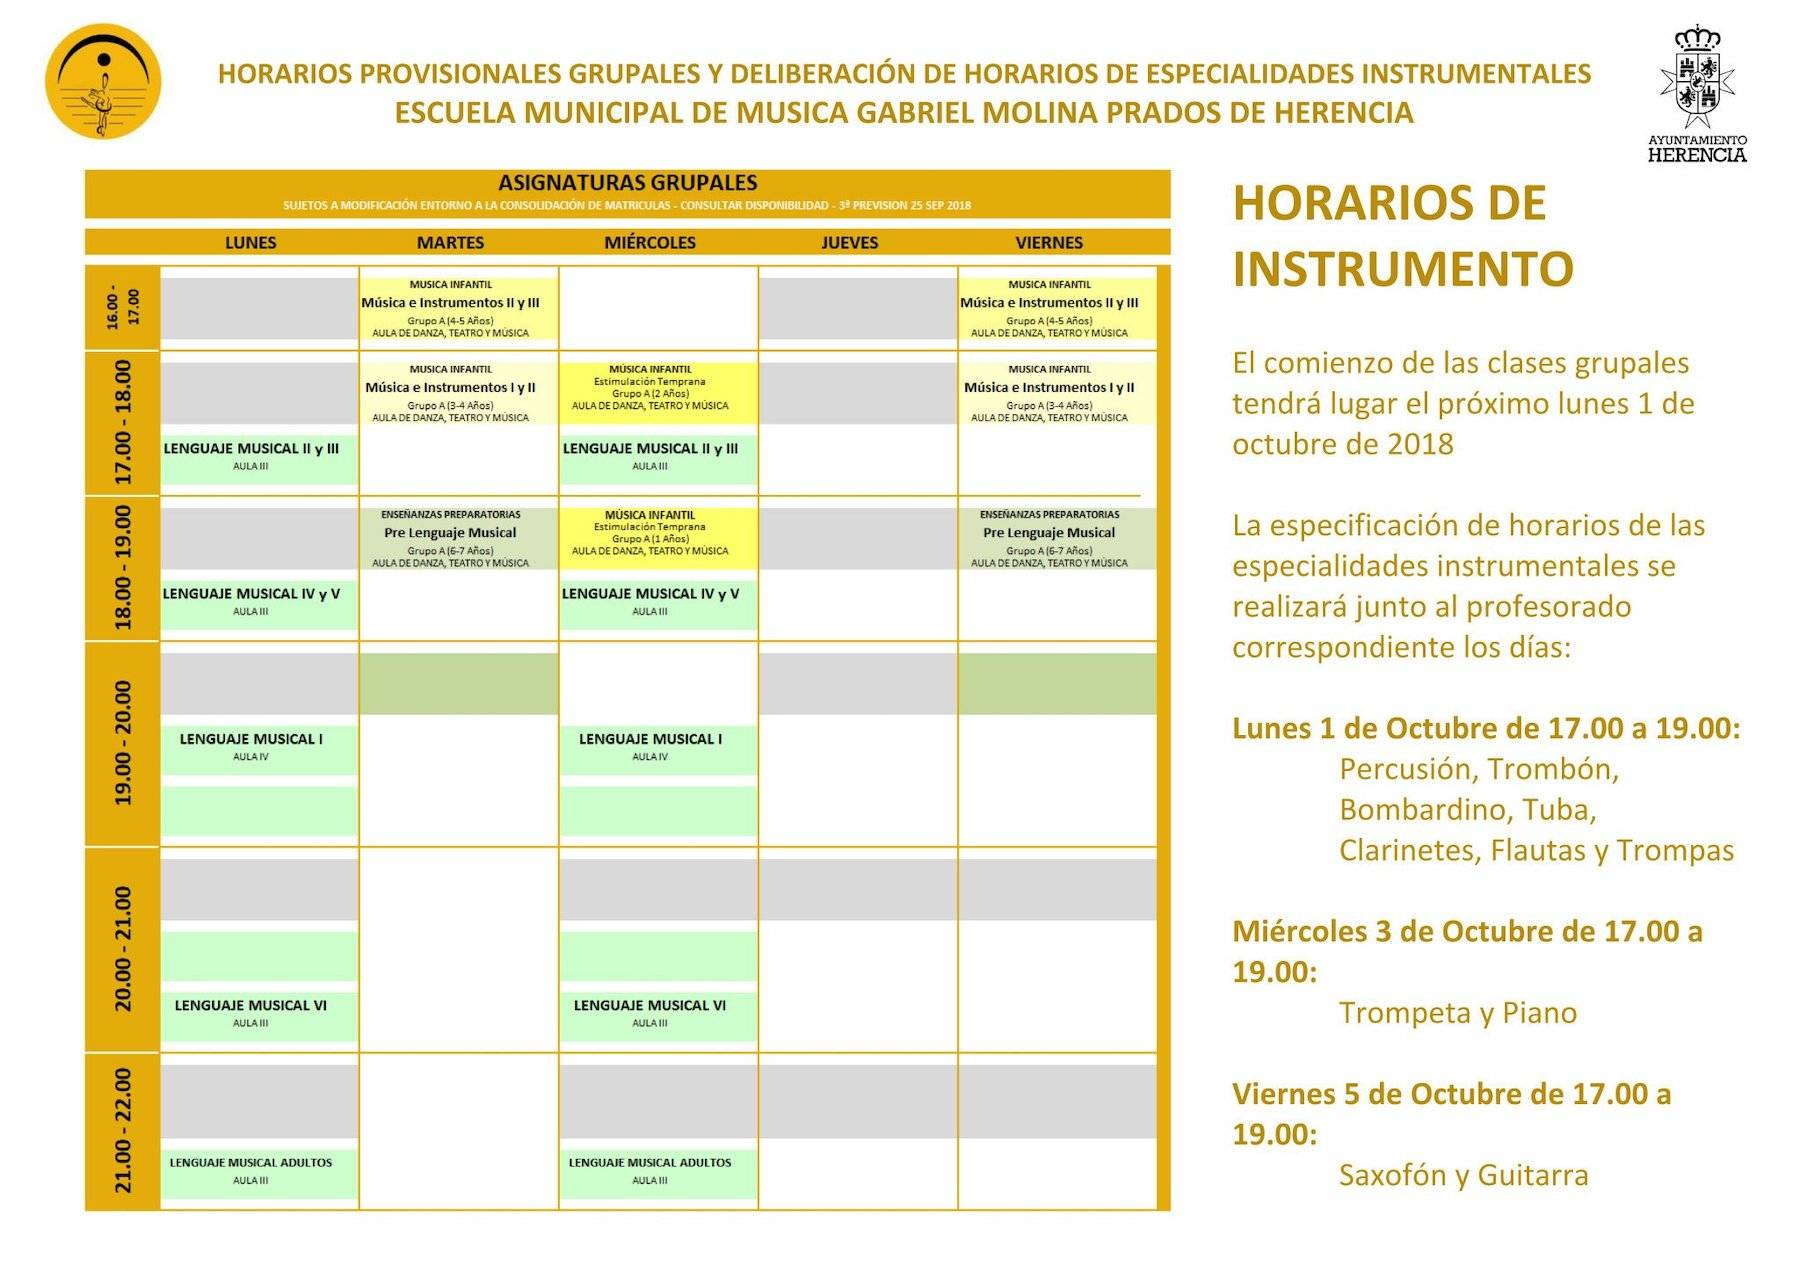 horarios instrumentos escuela musica herencia 2018 - Publicado los horarios de instrumento de la Escuela de Música de Herencia